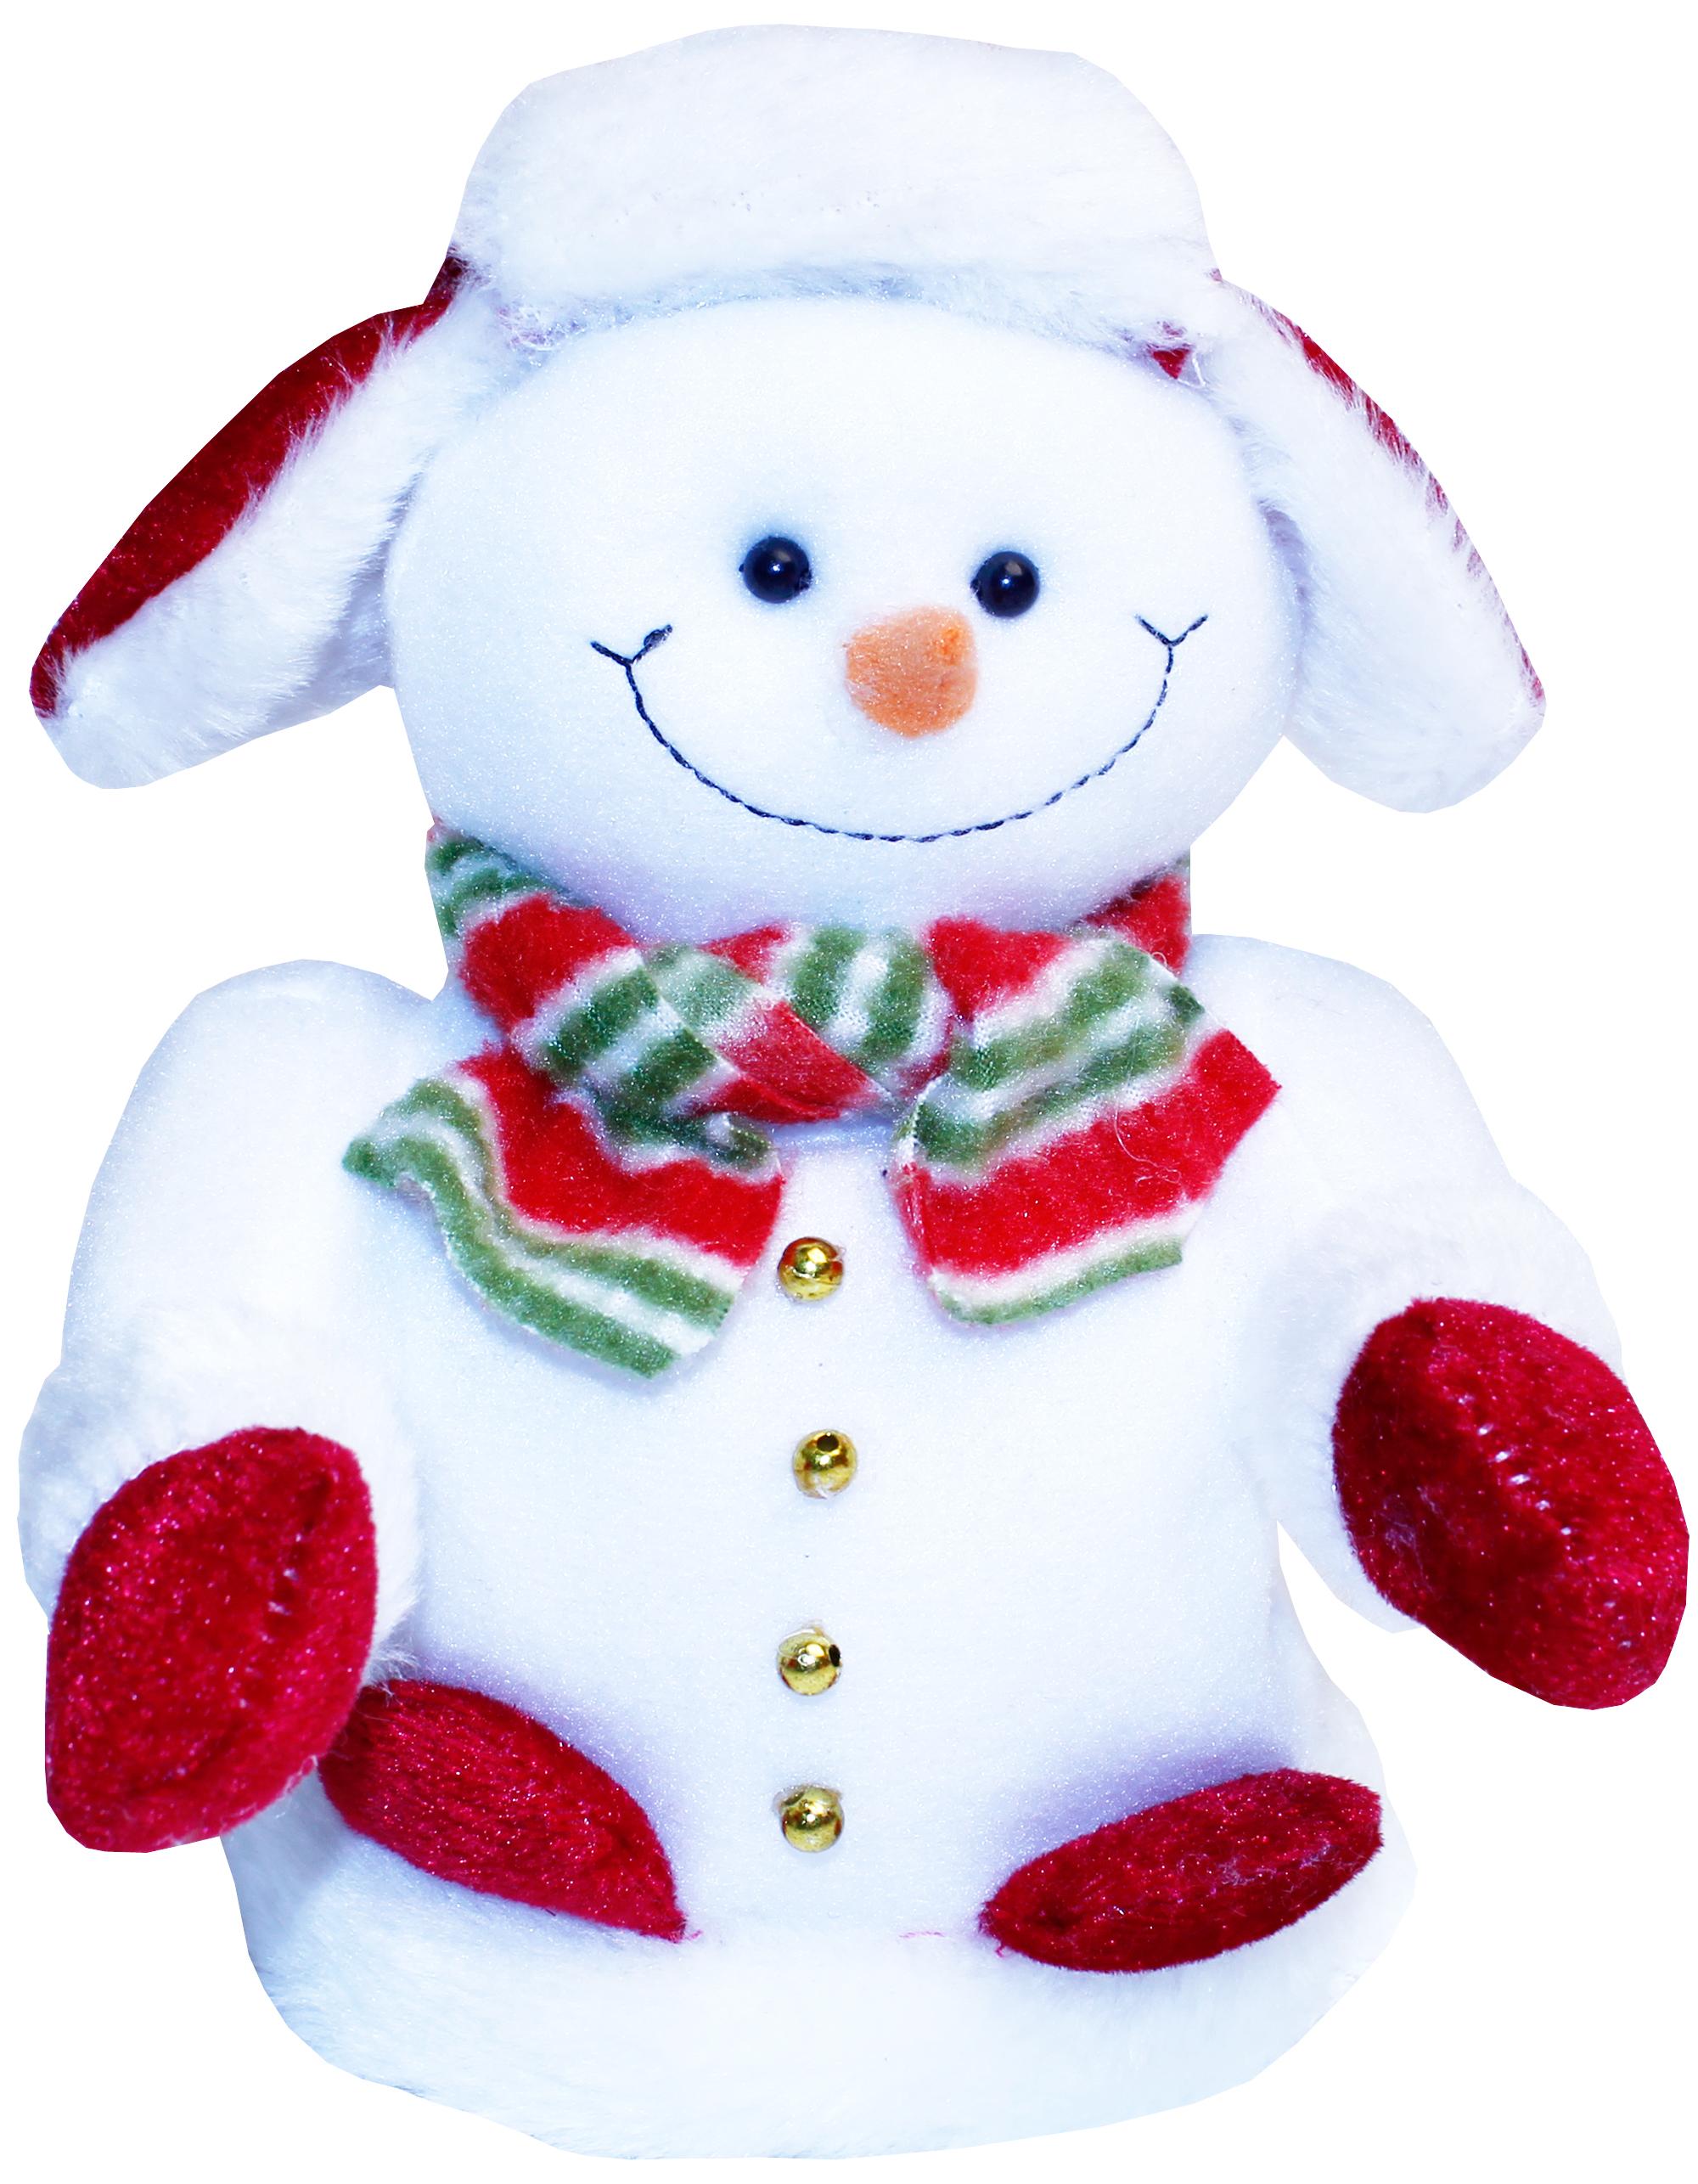 Игрушка Метелица Снеговик 19 см мягкая игрушка снеговик chl 500sm 28 см